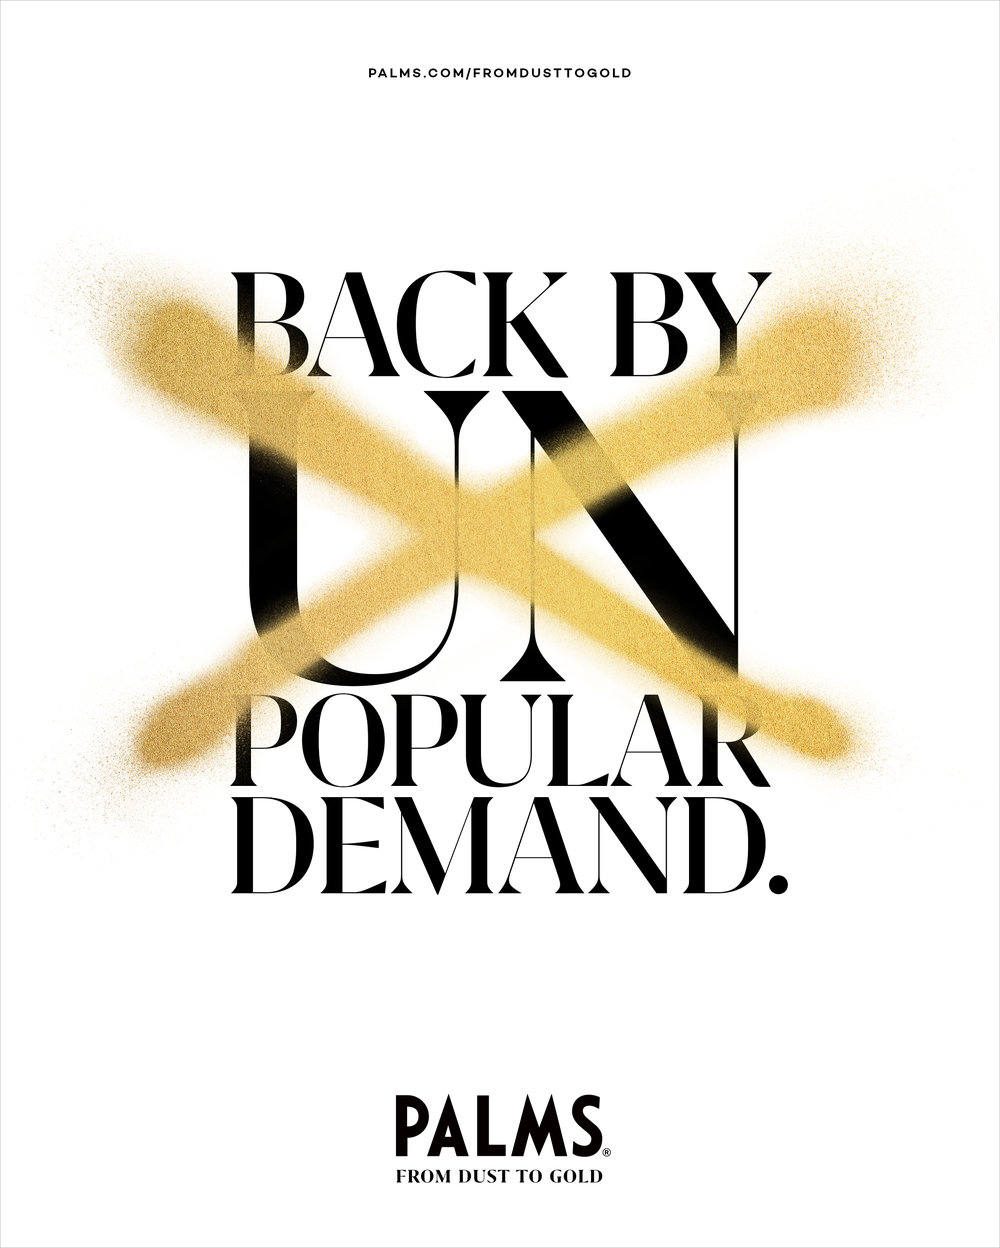 Palms-Print-Unpopular Demand copy.jpg